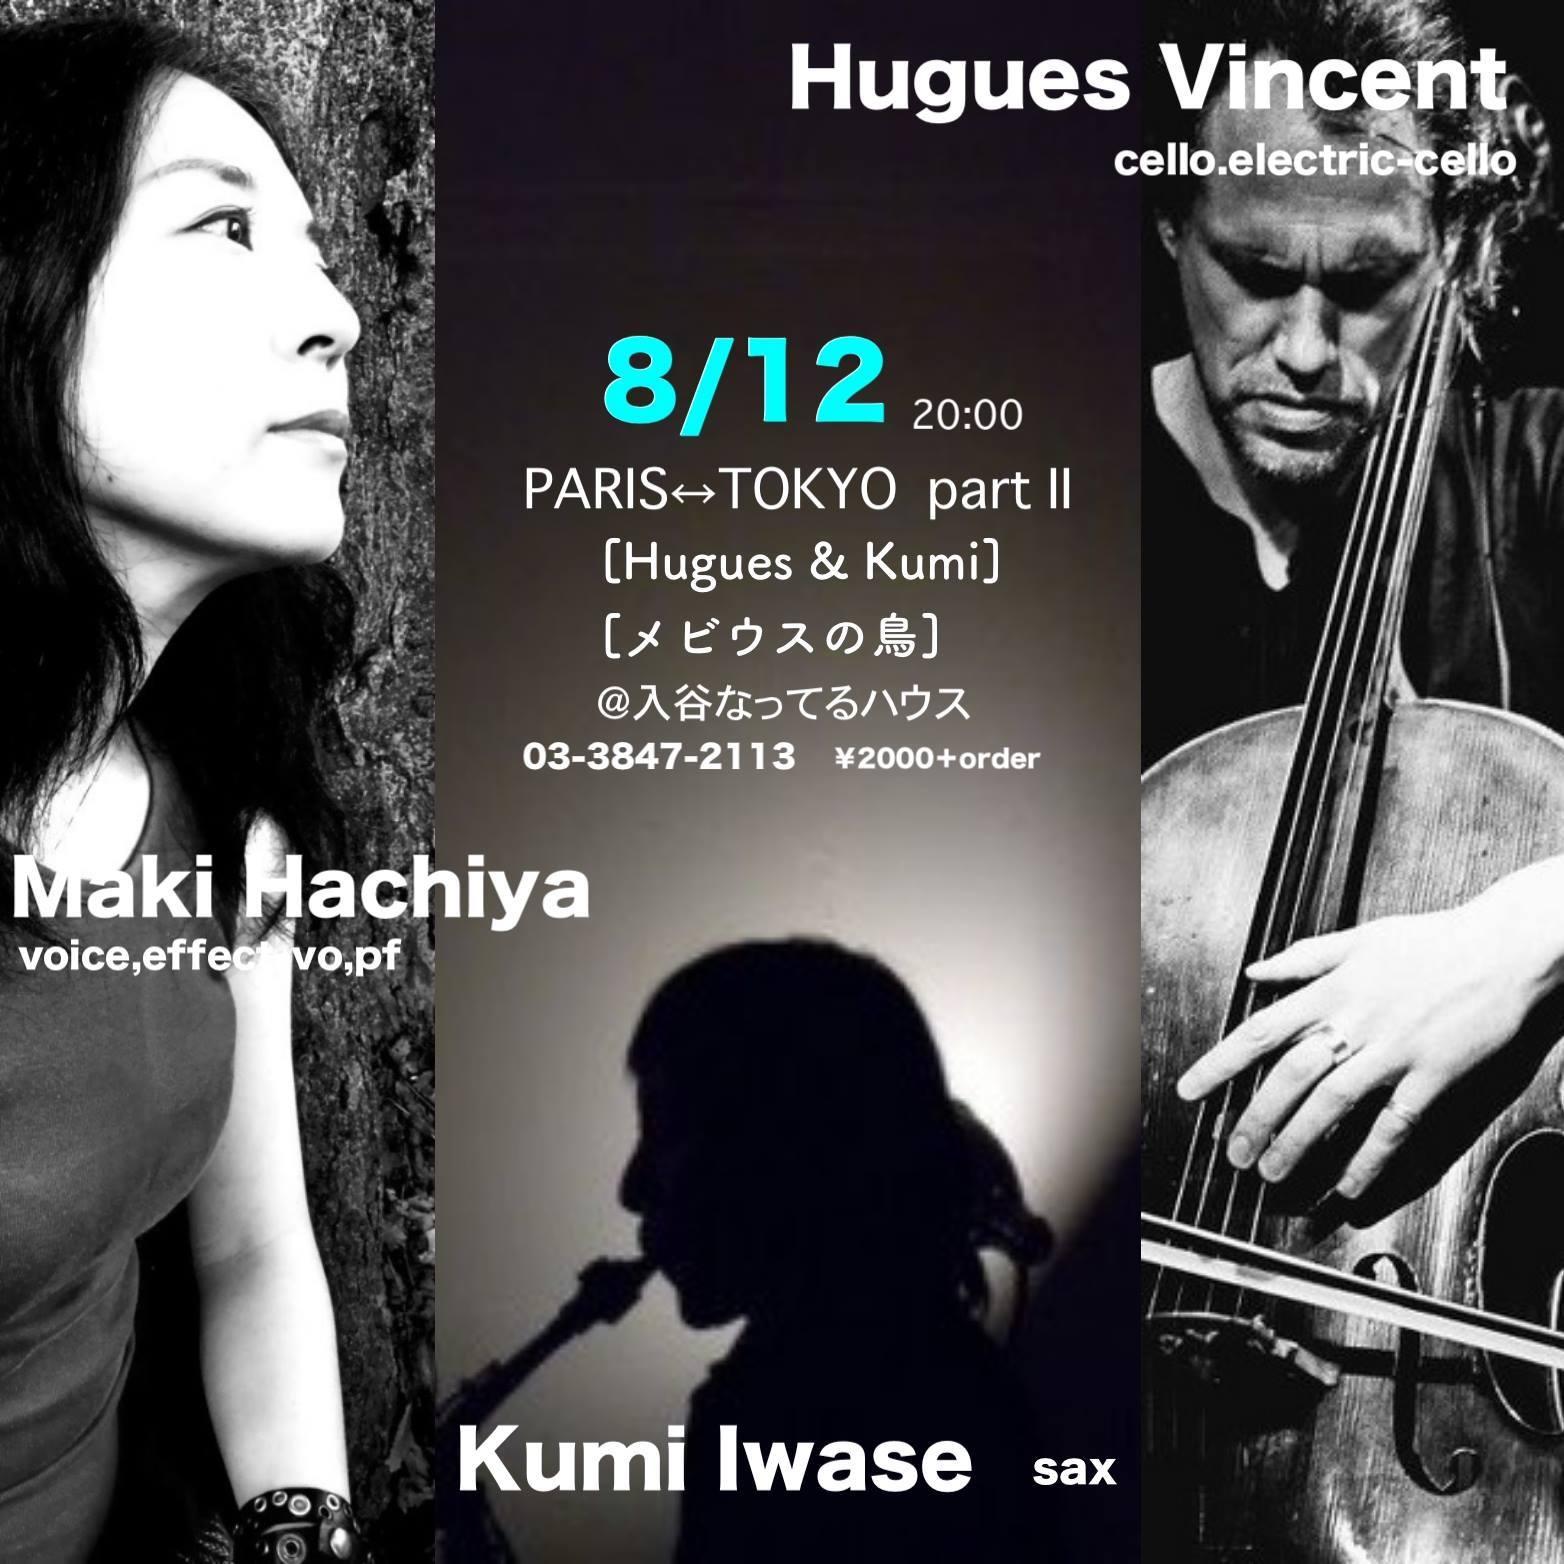 8/4&8/12【PARIS,TOKYO】2days!_d0244370_17080168.jpg